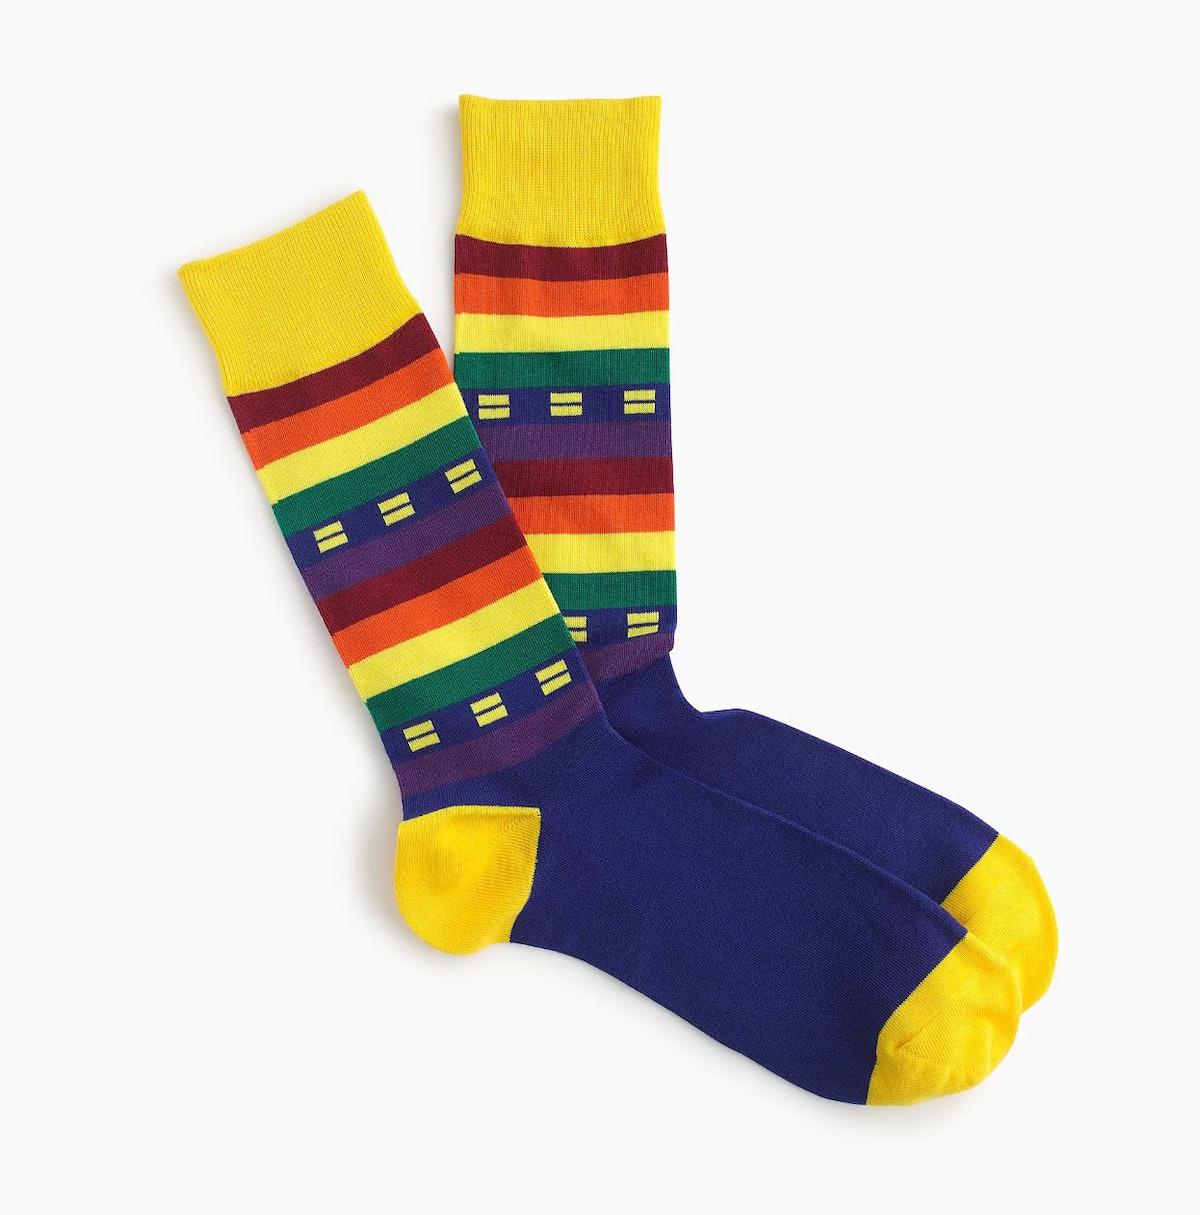 J.Crew X Human Rights Campaign Pride flag socks